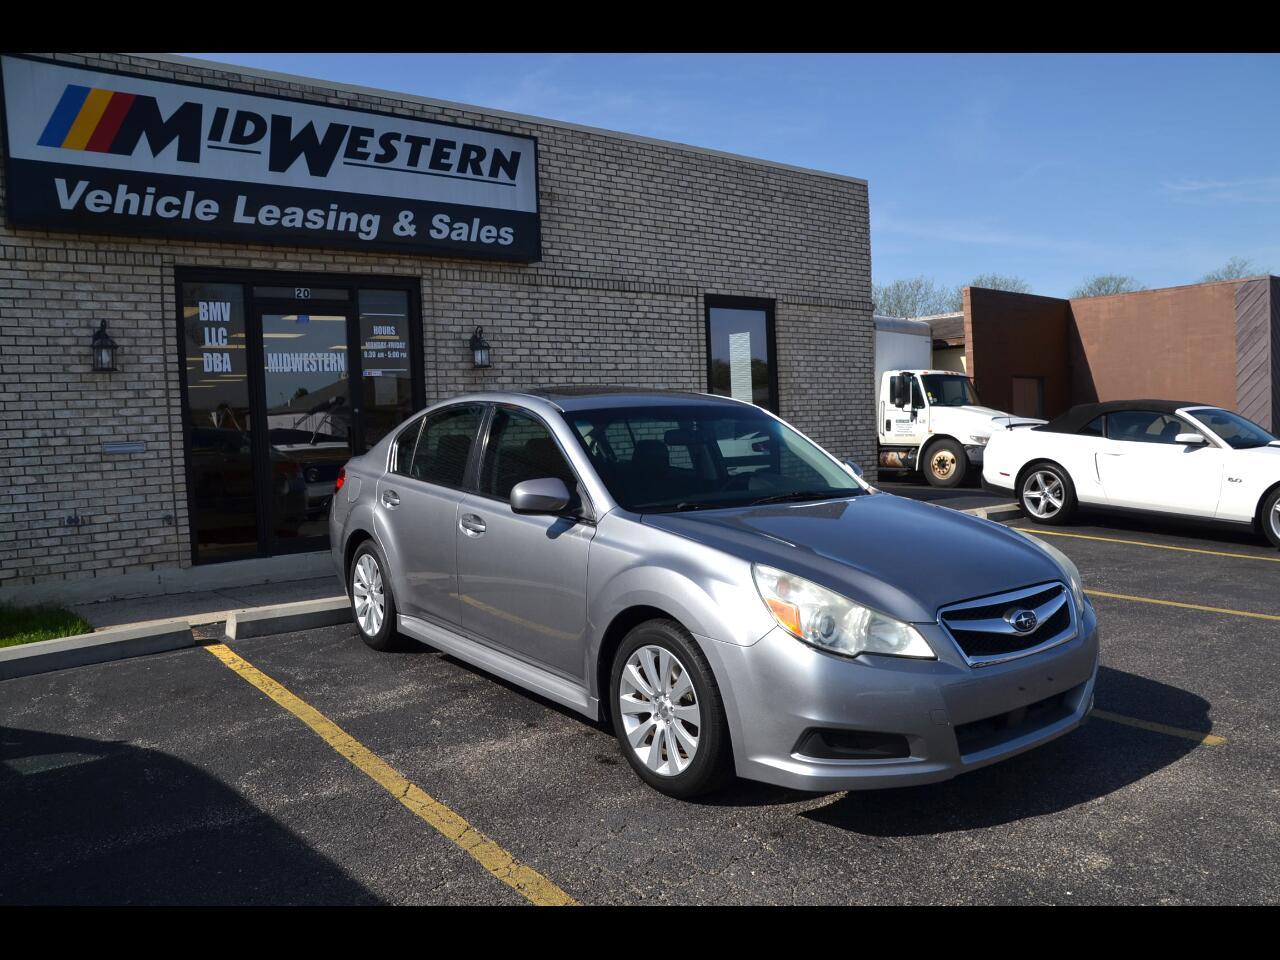 Subaru Legacy 4dr Sdn H6 Auto 3.6R Ltd Pwr Moon/Navigation 2011